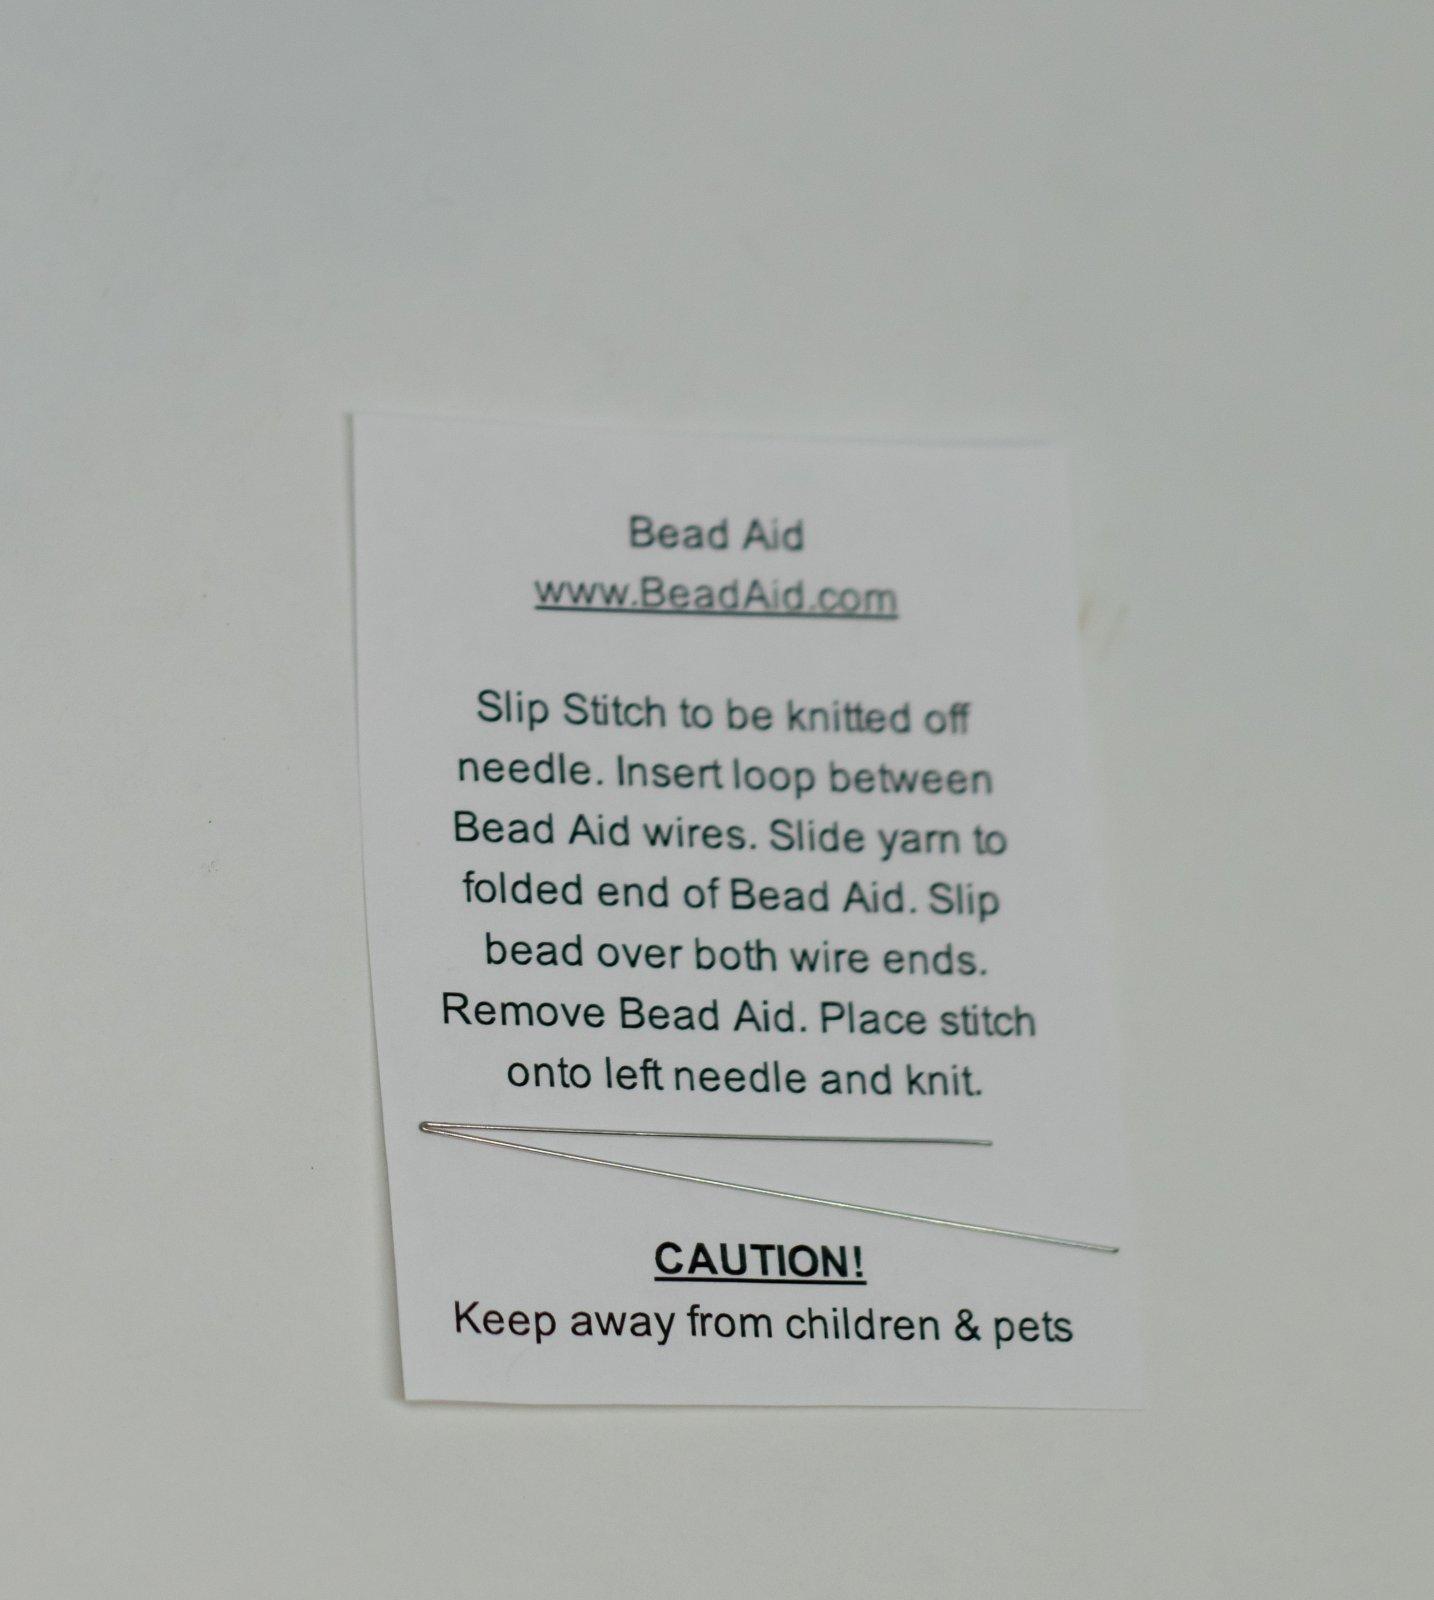 Bead Aid